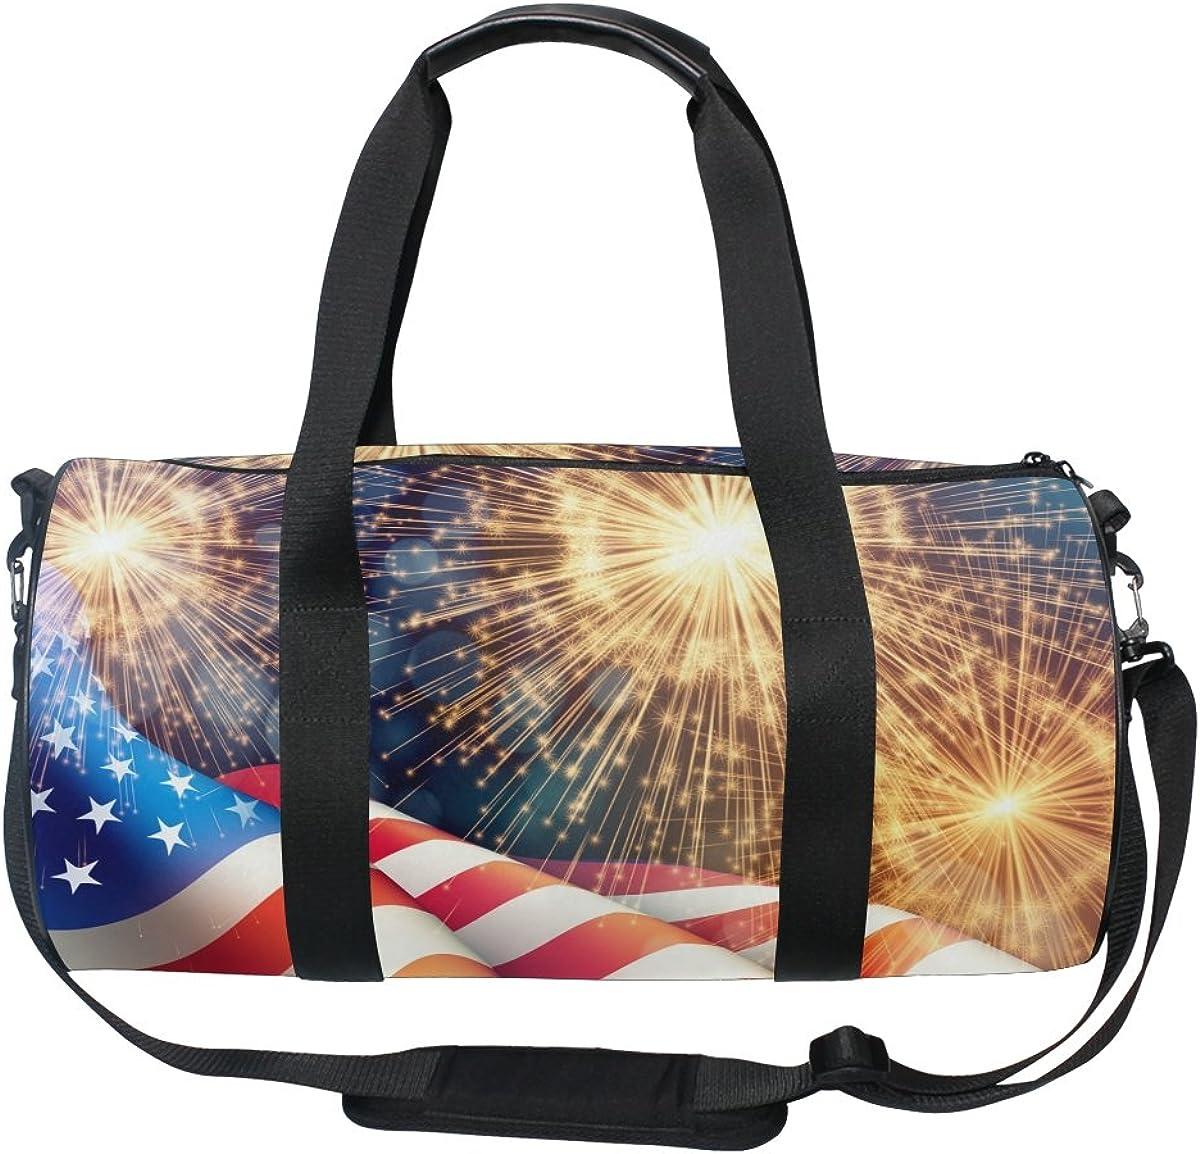 ALAZA 4th of July with Fireworks Sports Gym Duffel Bag Travel Luggage Handbag for Men Women